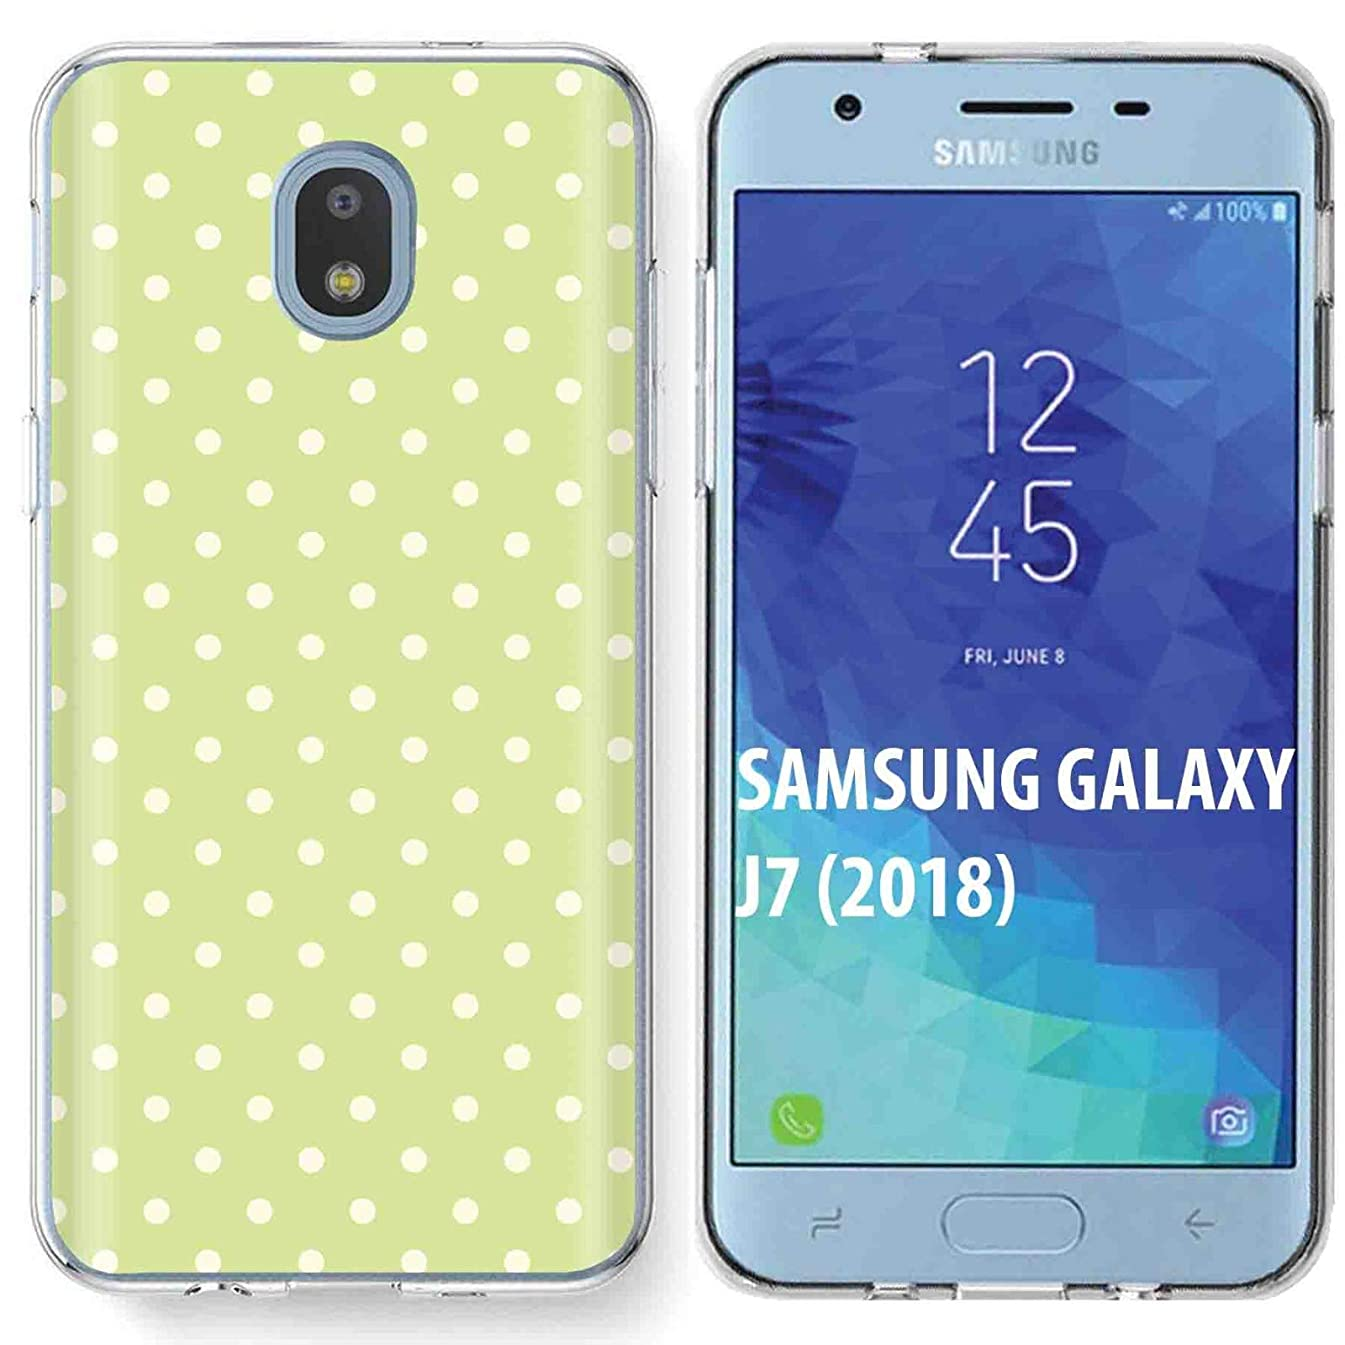 Samsung Galaxy (J7 2018) (J737) Case [TalkingCase] Premium Thin Gel TPU Phone Cover Samsung J7 Refine/J7 Star/J7 Aero/J7 V 2nd Gen/J7 Crown/J7 Aura/J7 Top [Yellow Polka Dots] Design